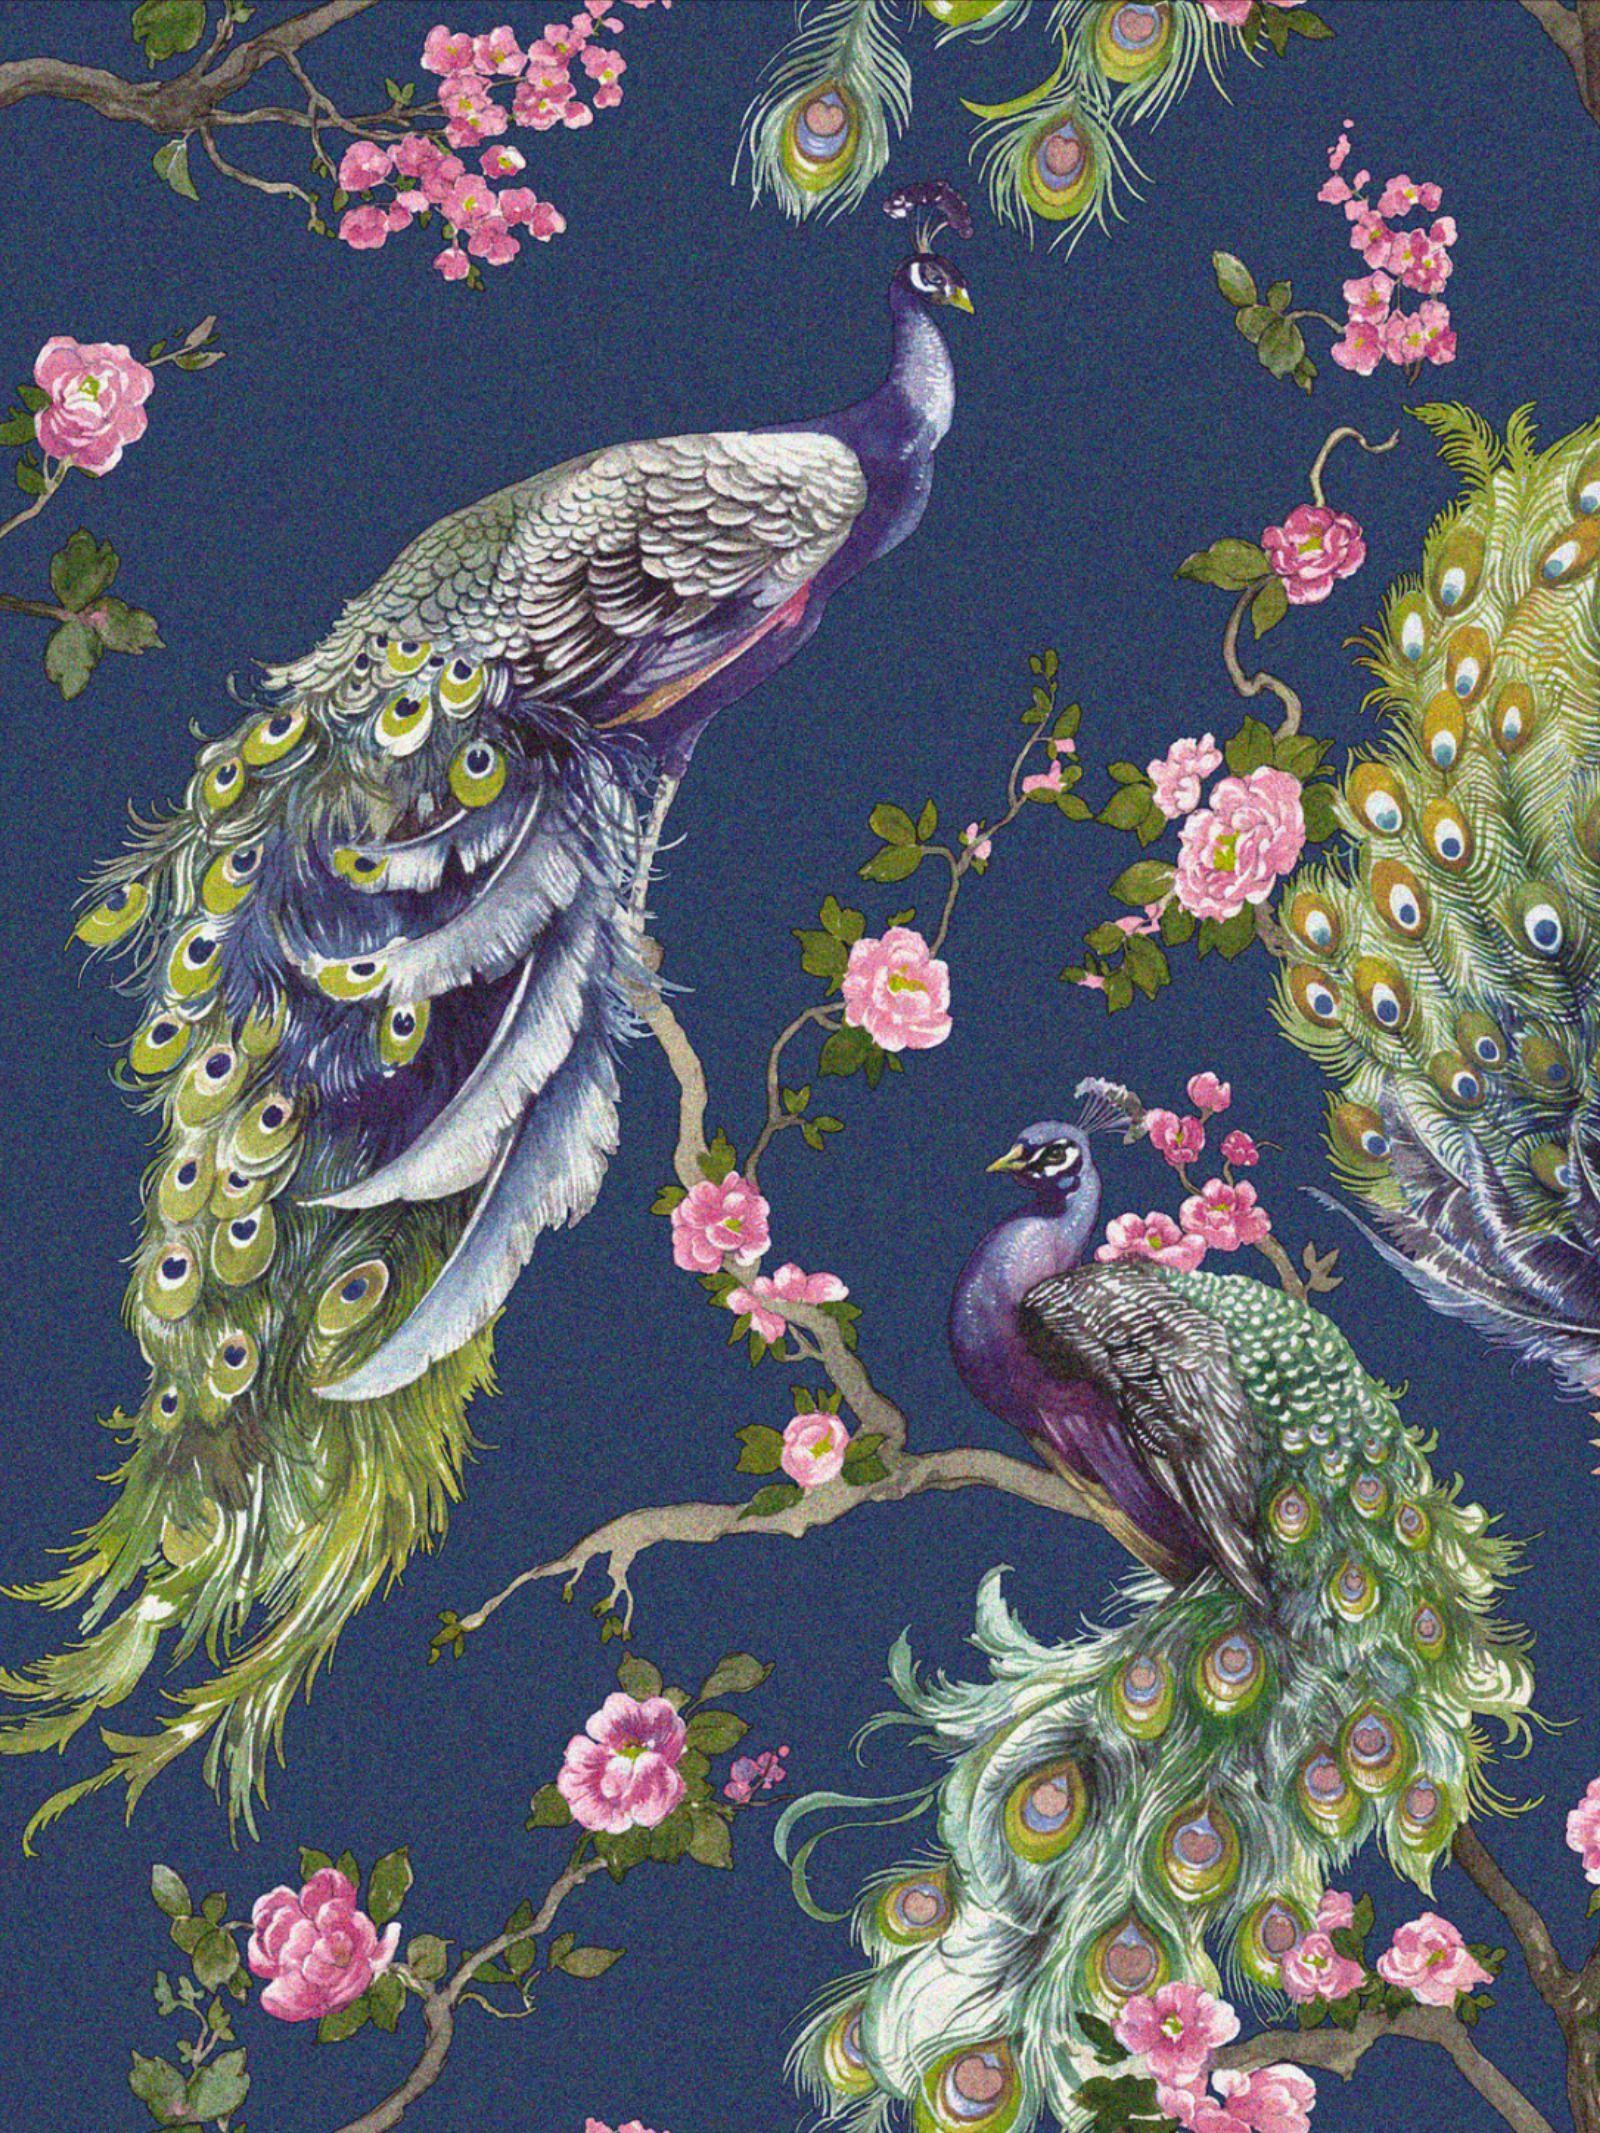 Holden Decor Menali Wallpaper Vinyl Glitter Floral Peacock Feathers Wallpaper